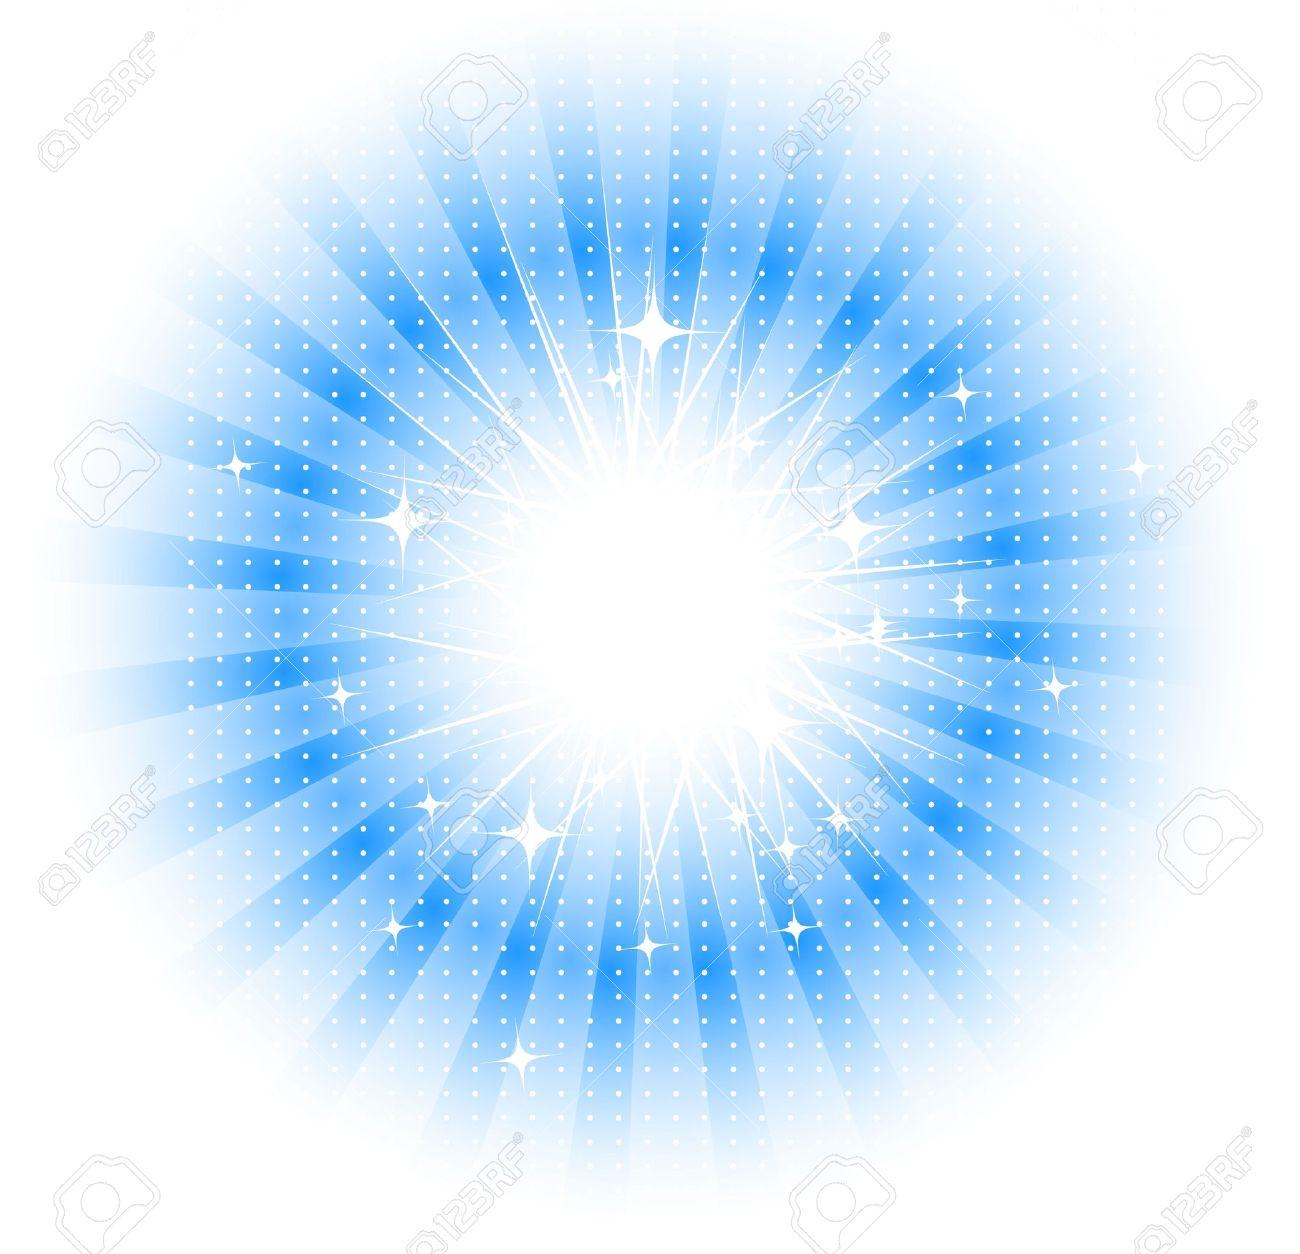 Sun Rays Clipart Png - Sun Shining PNG HD